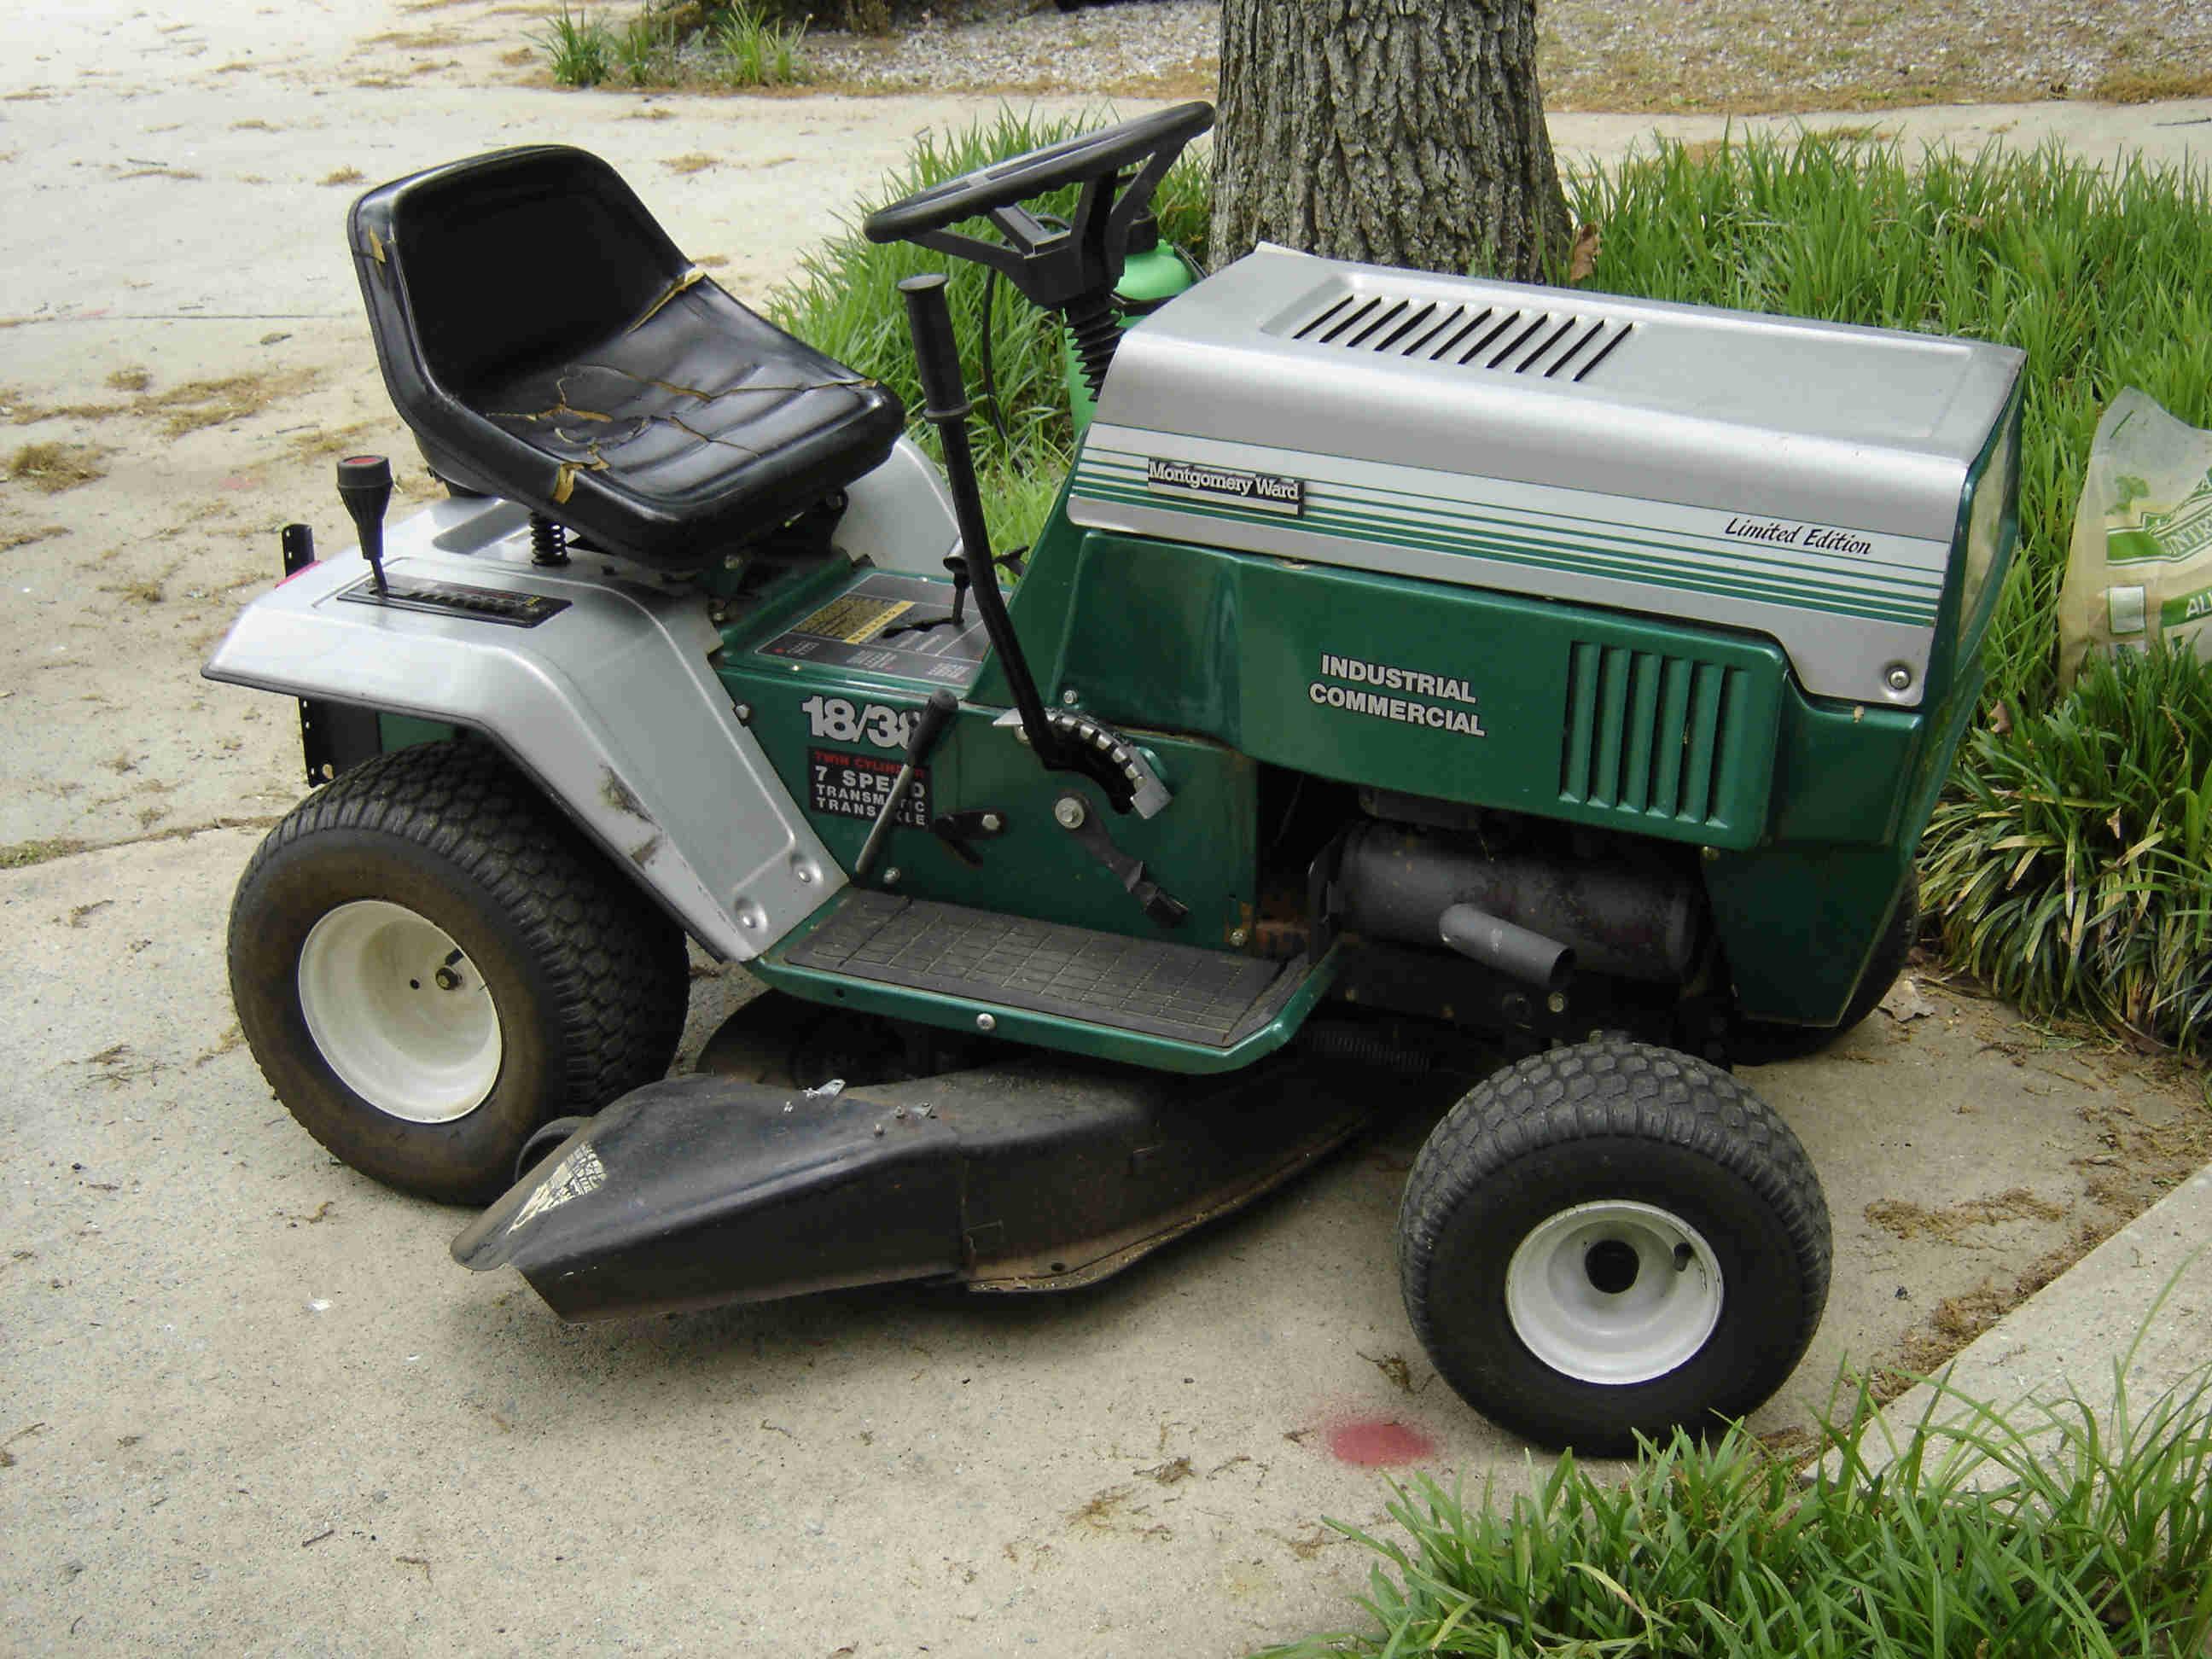 John Deere Riding Lawn Mower Model 10 Lawnmowermodelr72i Need The Assembly Diagram